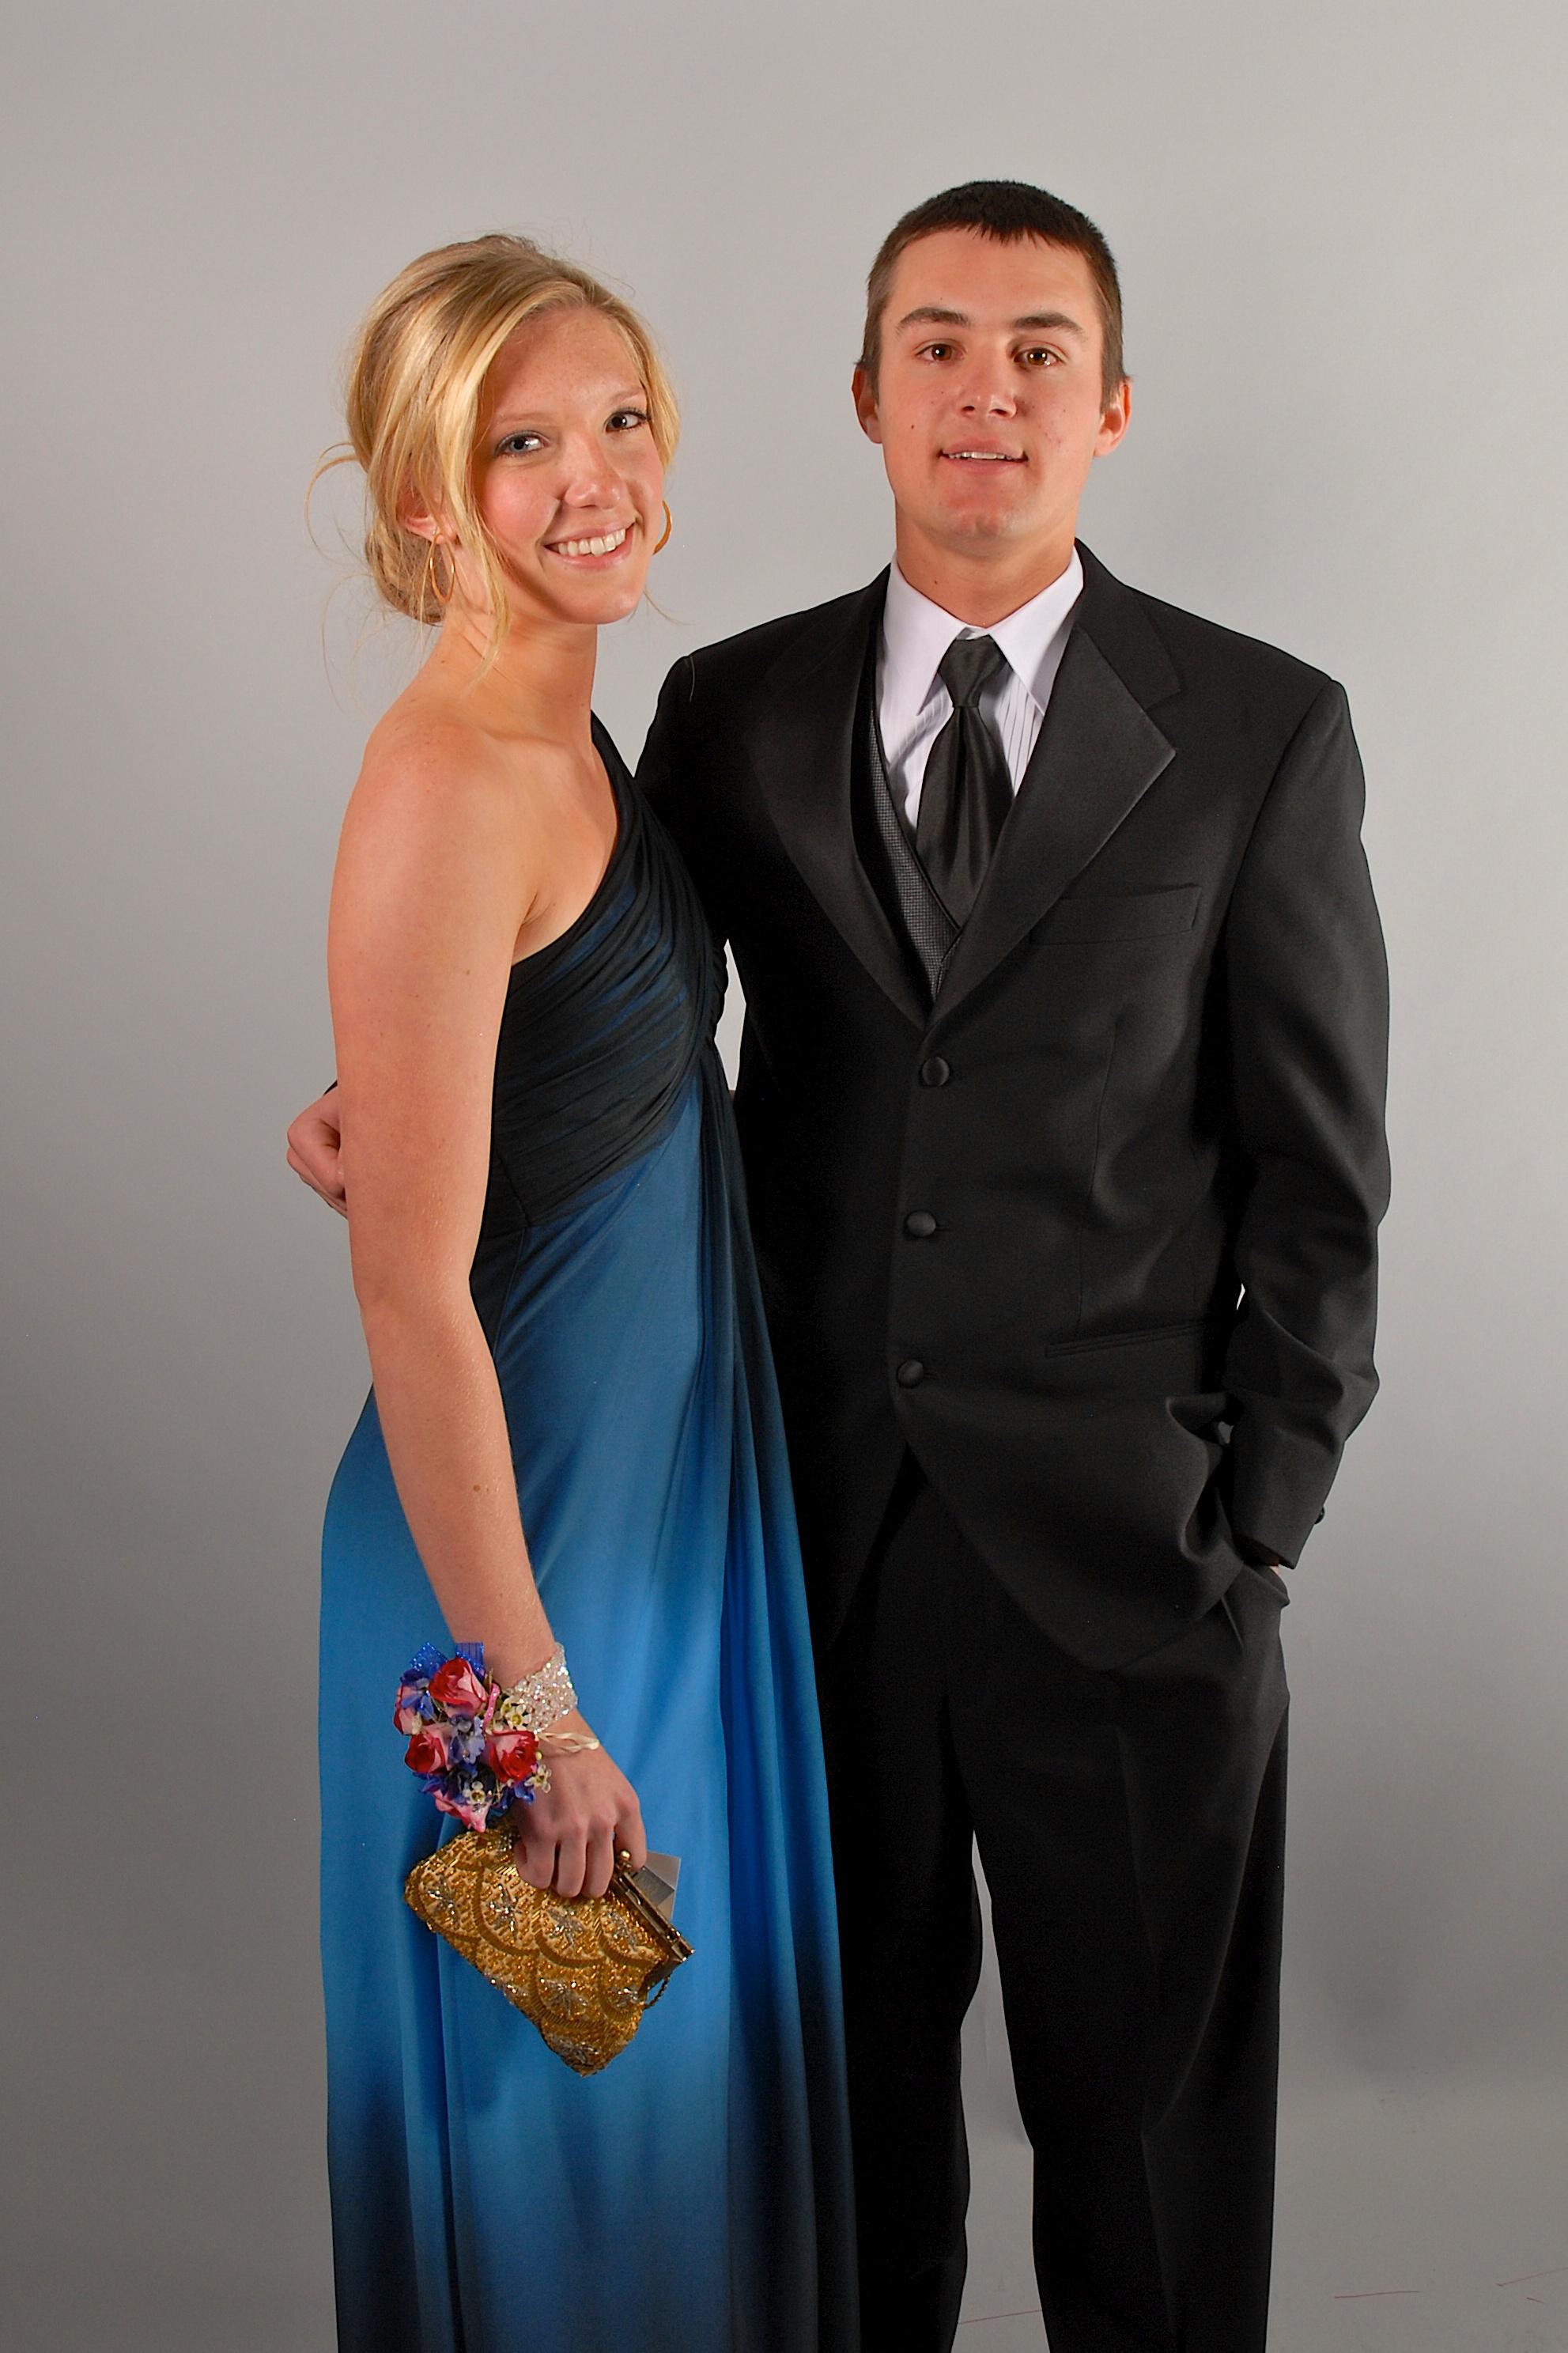 Professional Prom Photos | www.pixshark.com - Images ...